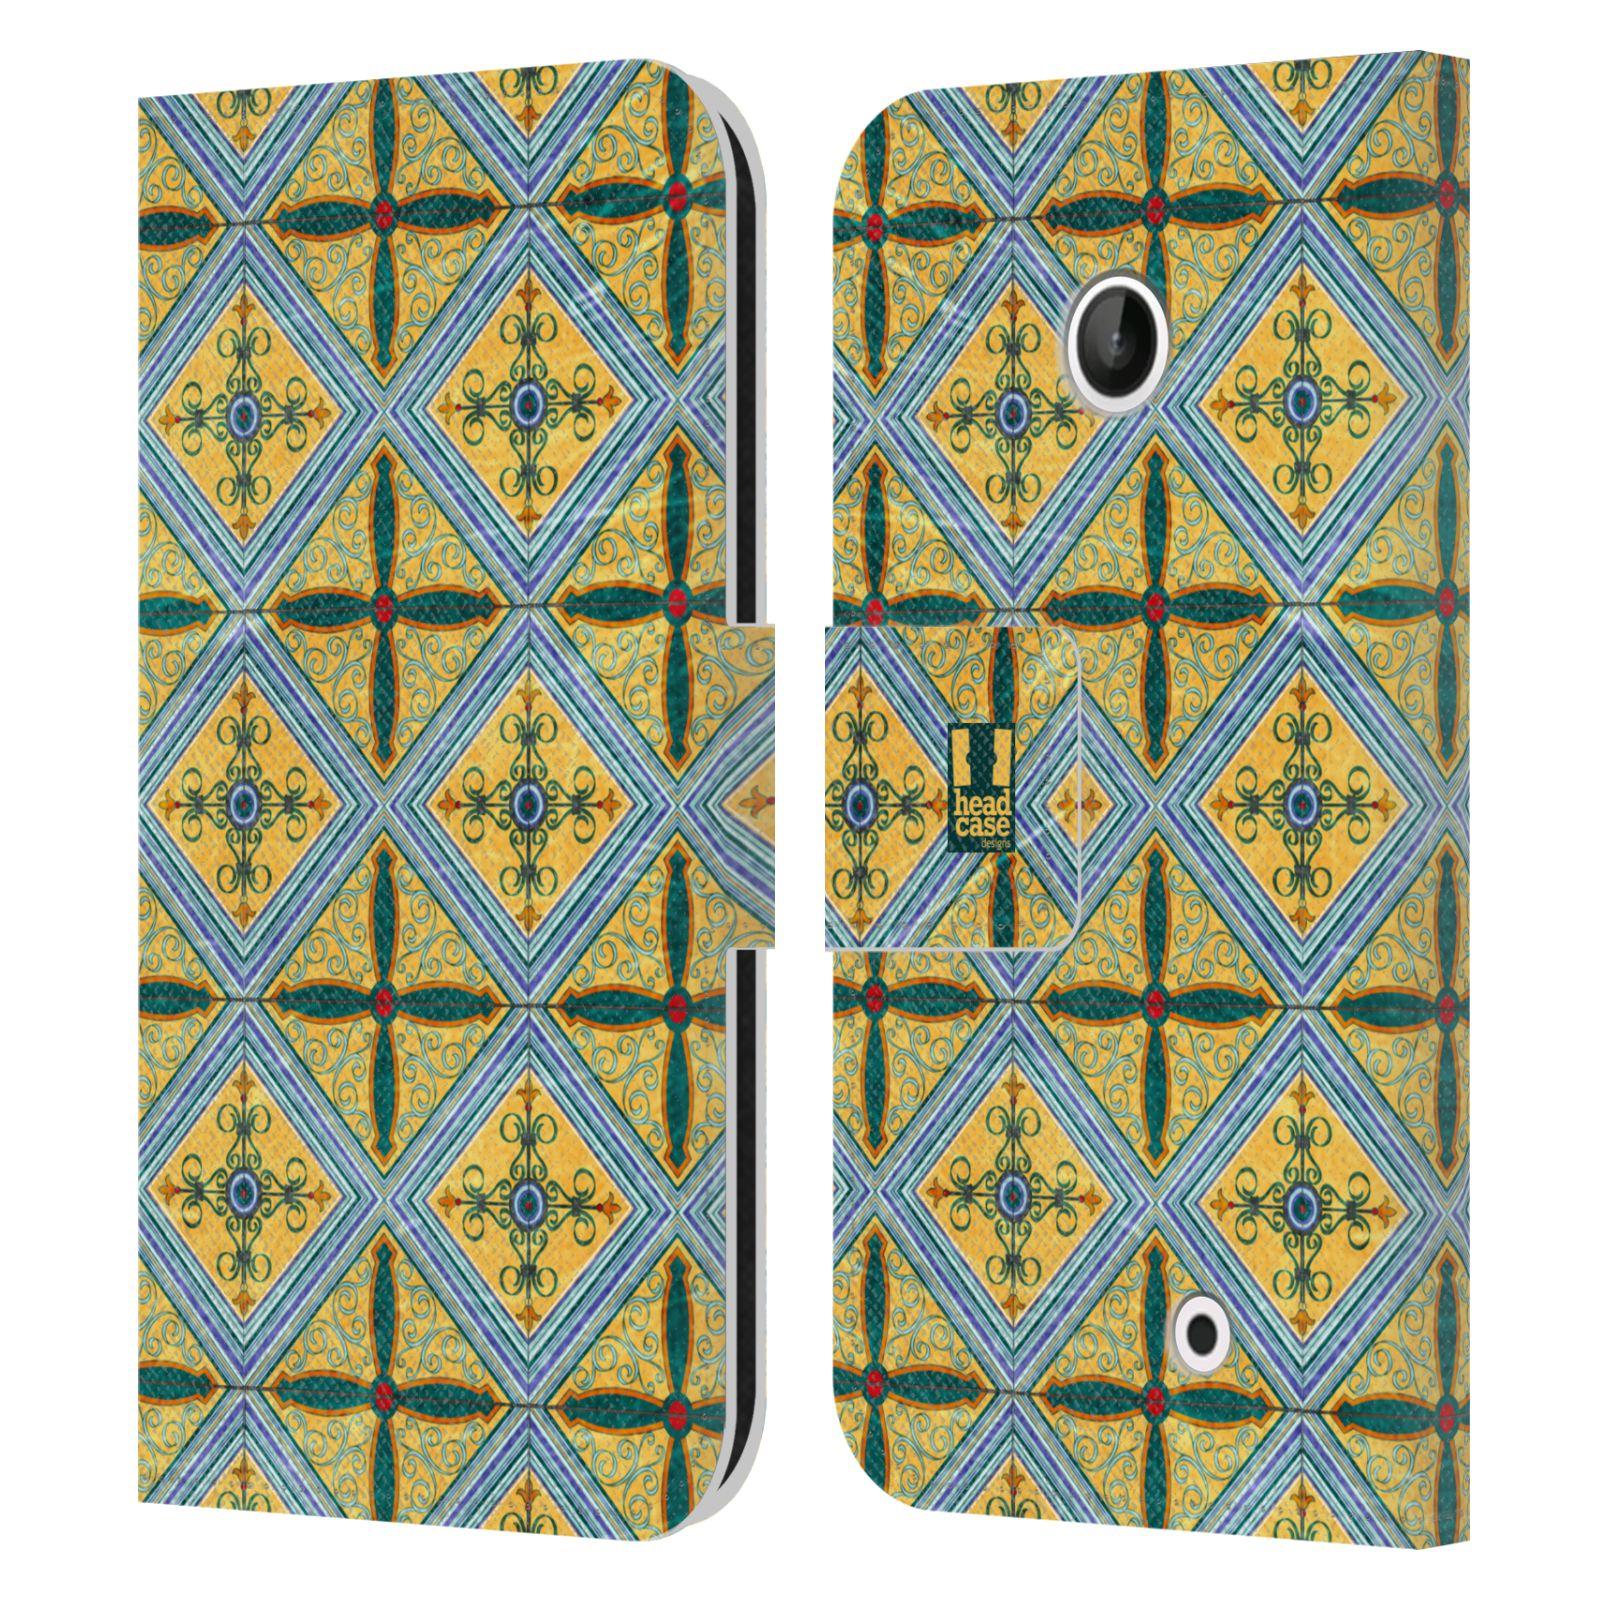 HEAD CASE Flipové pouzdro pro mobil NOKIA LUMIA 630 / LUMIA 630 DUAL ARABESKA CERAMIC žlutá